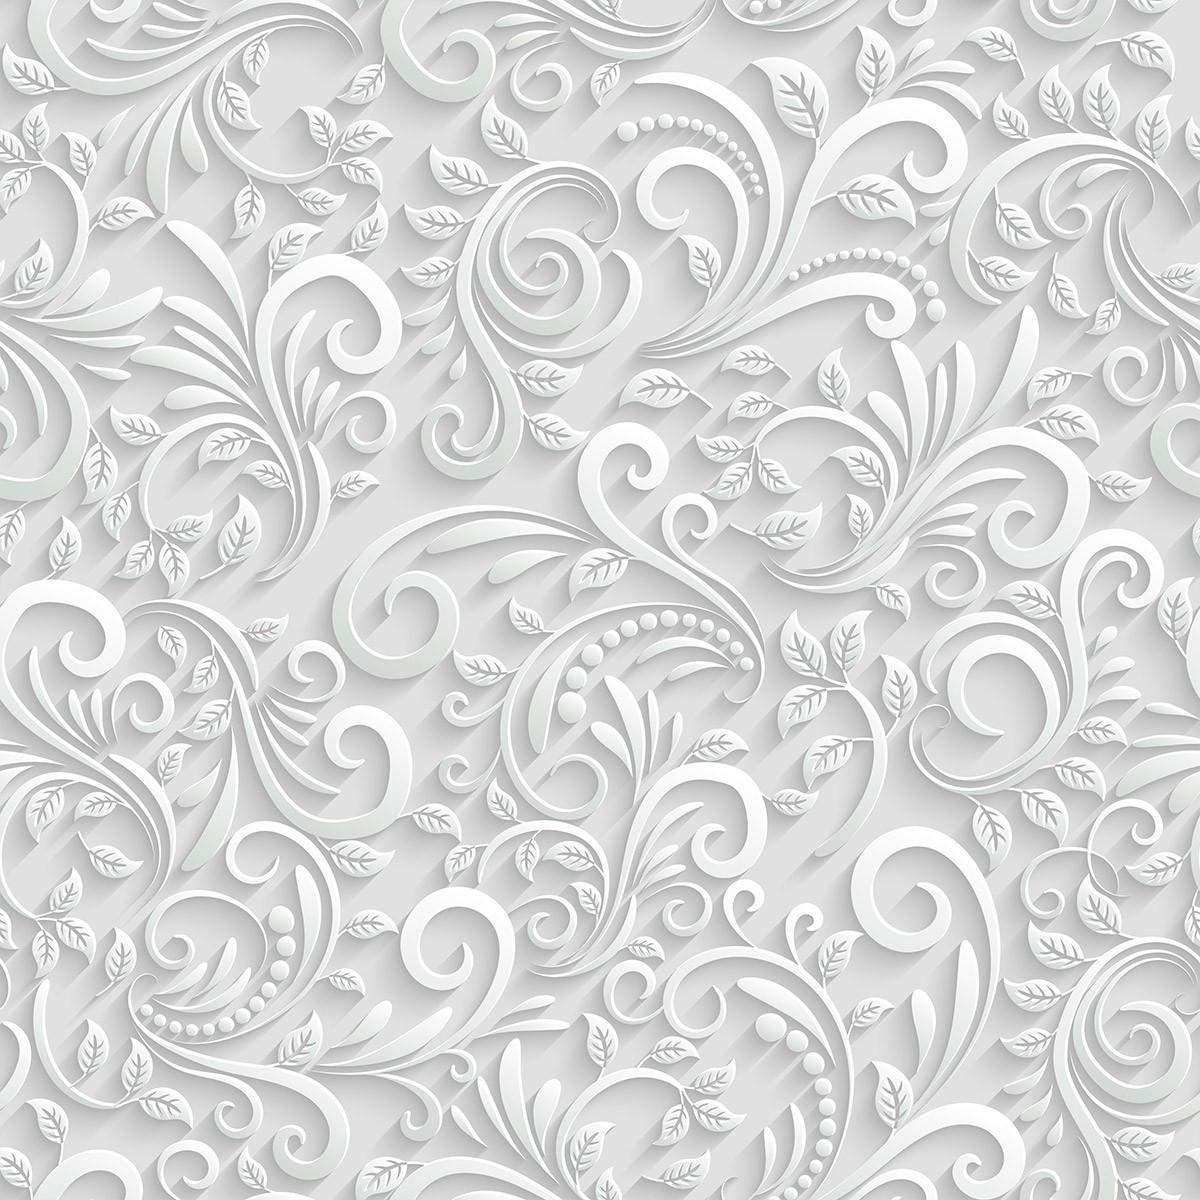 Papel de Parede 3D Arabesco Tribal Folhas Abstrato Adesivo